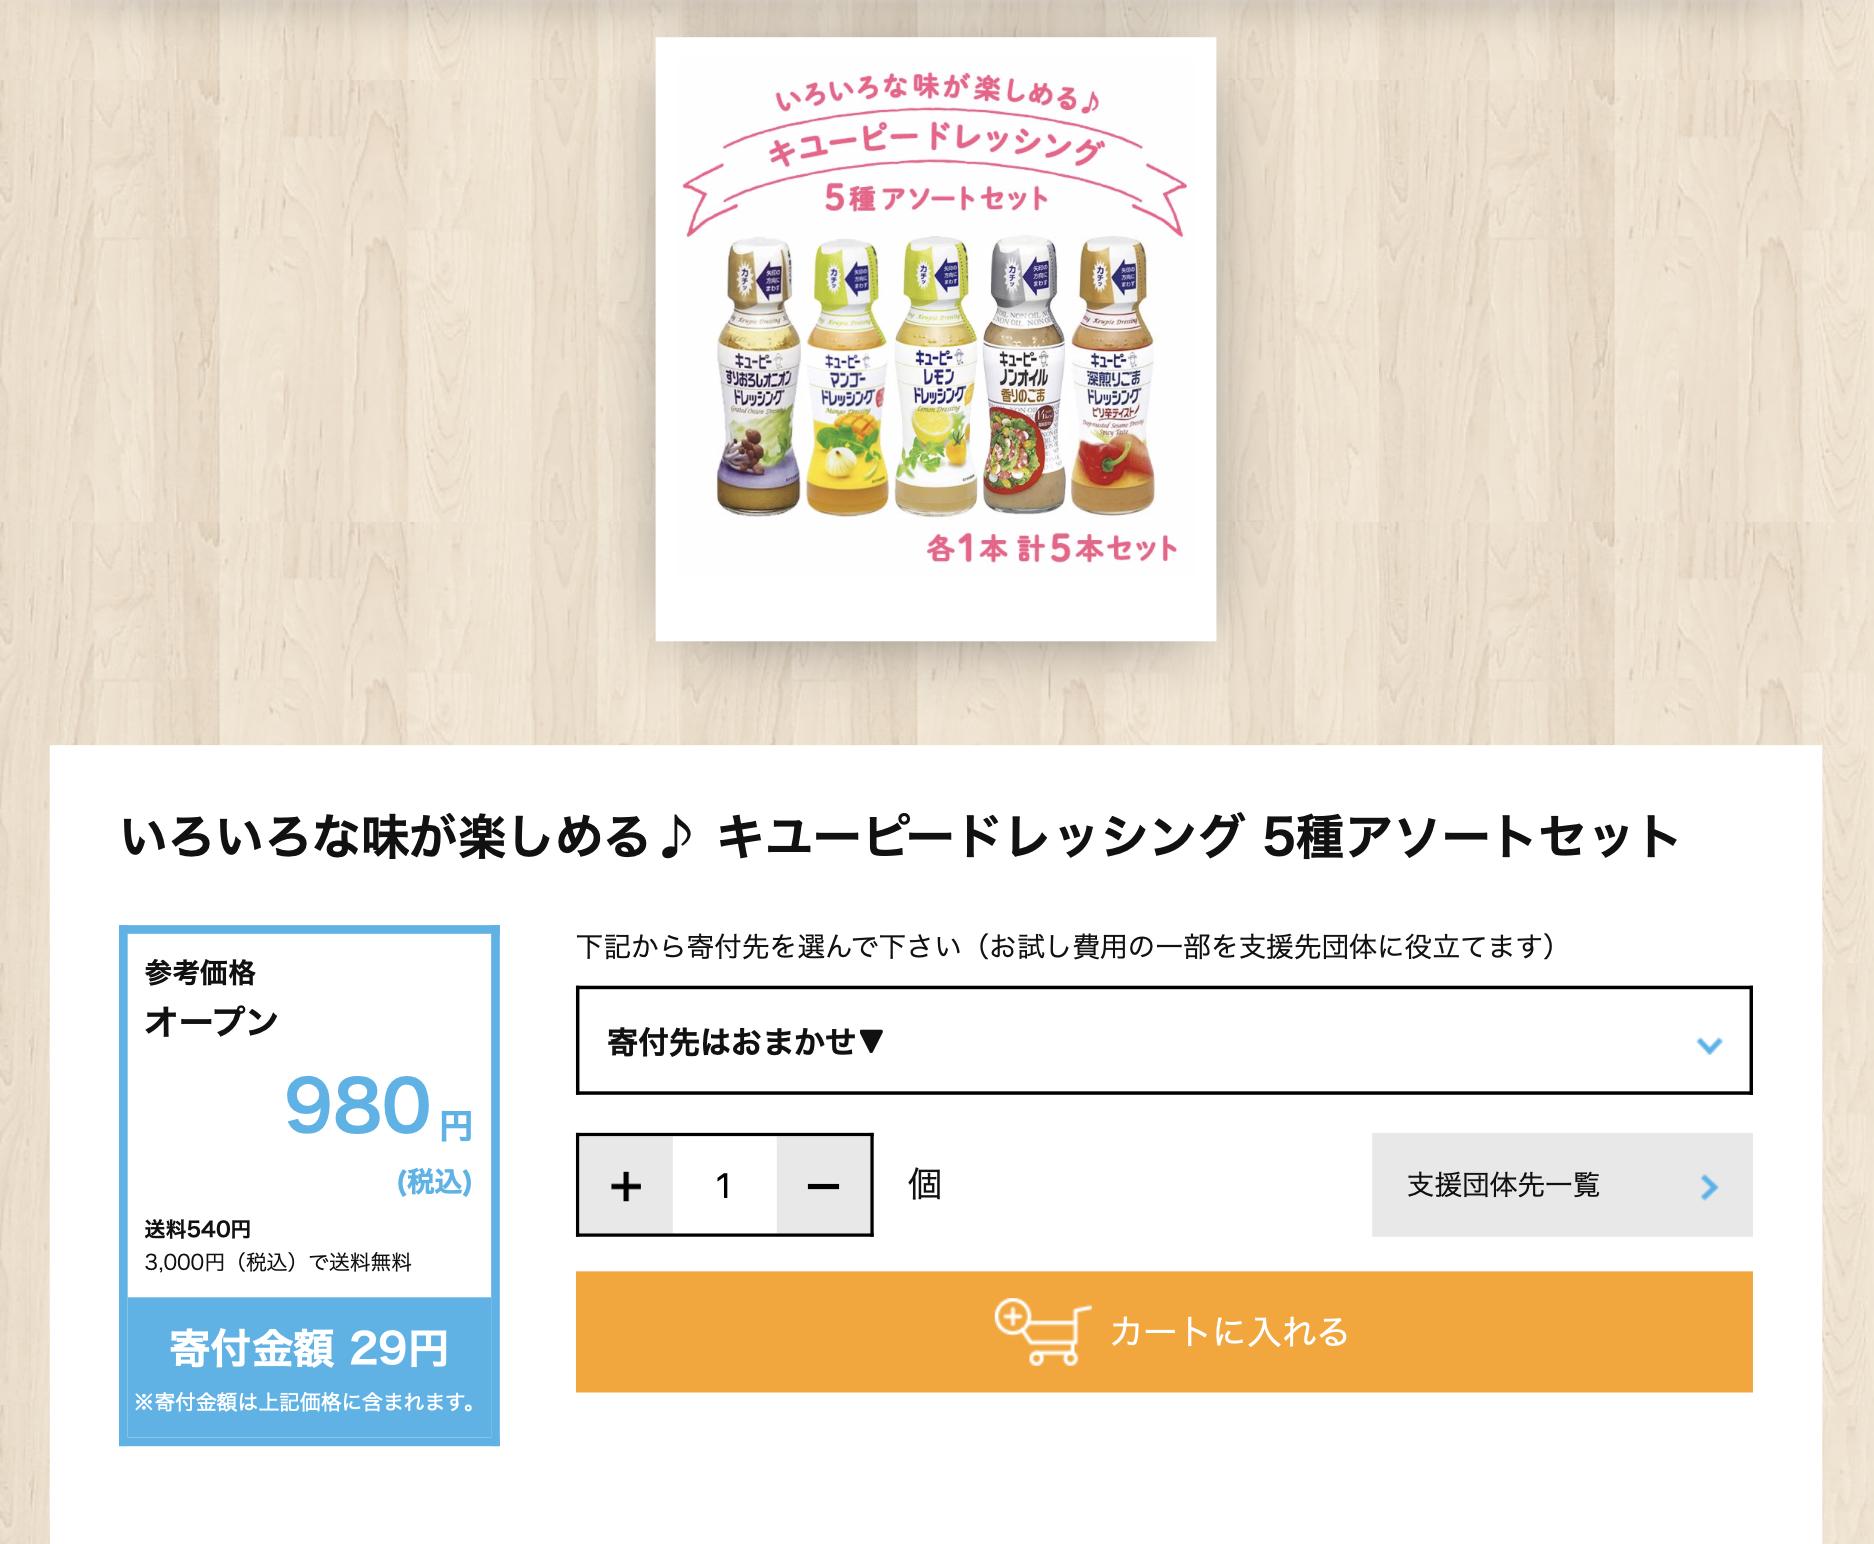 Otameshi(オタメシ) 購入例